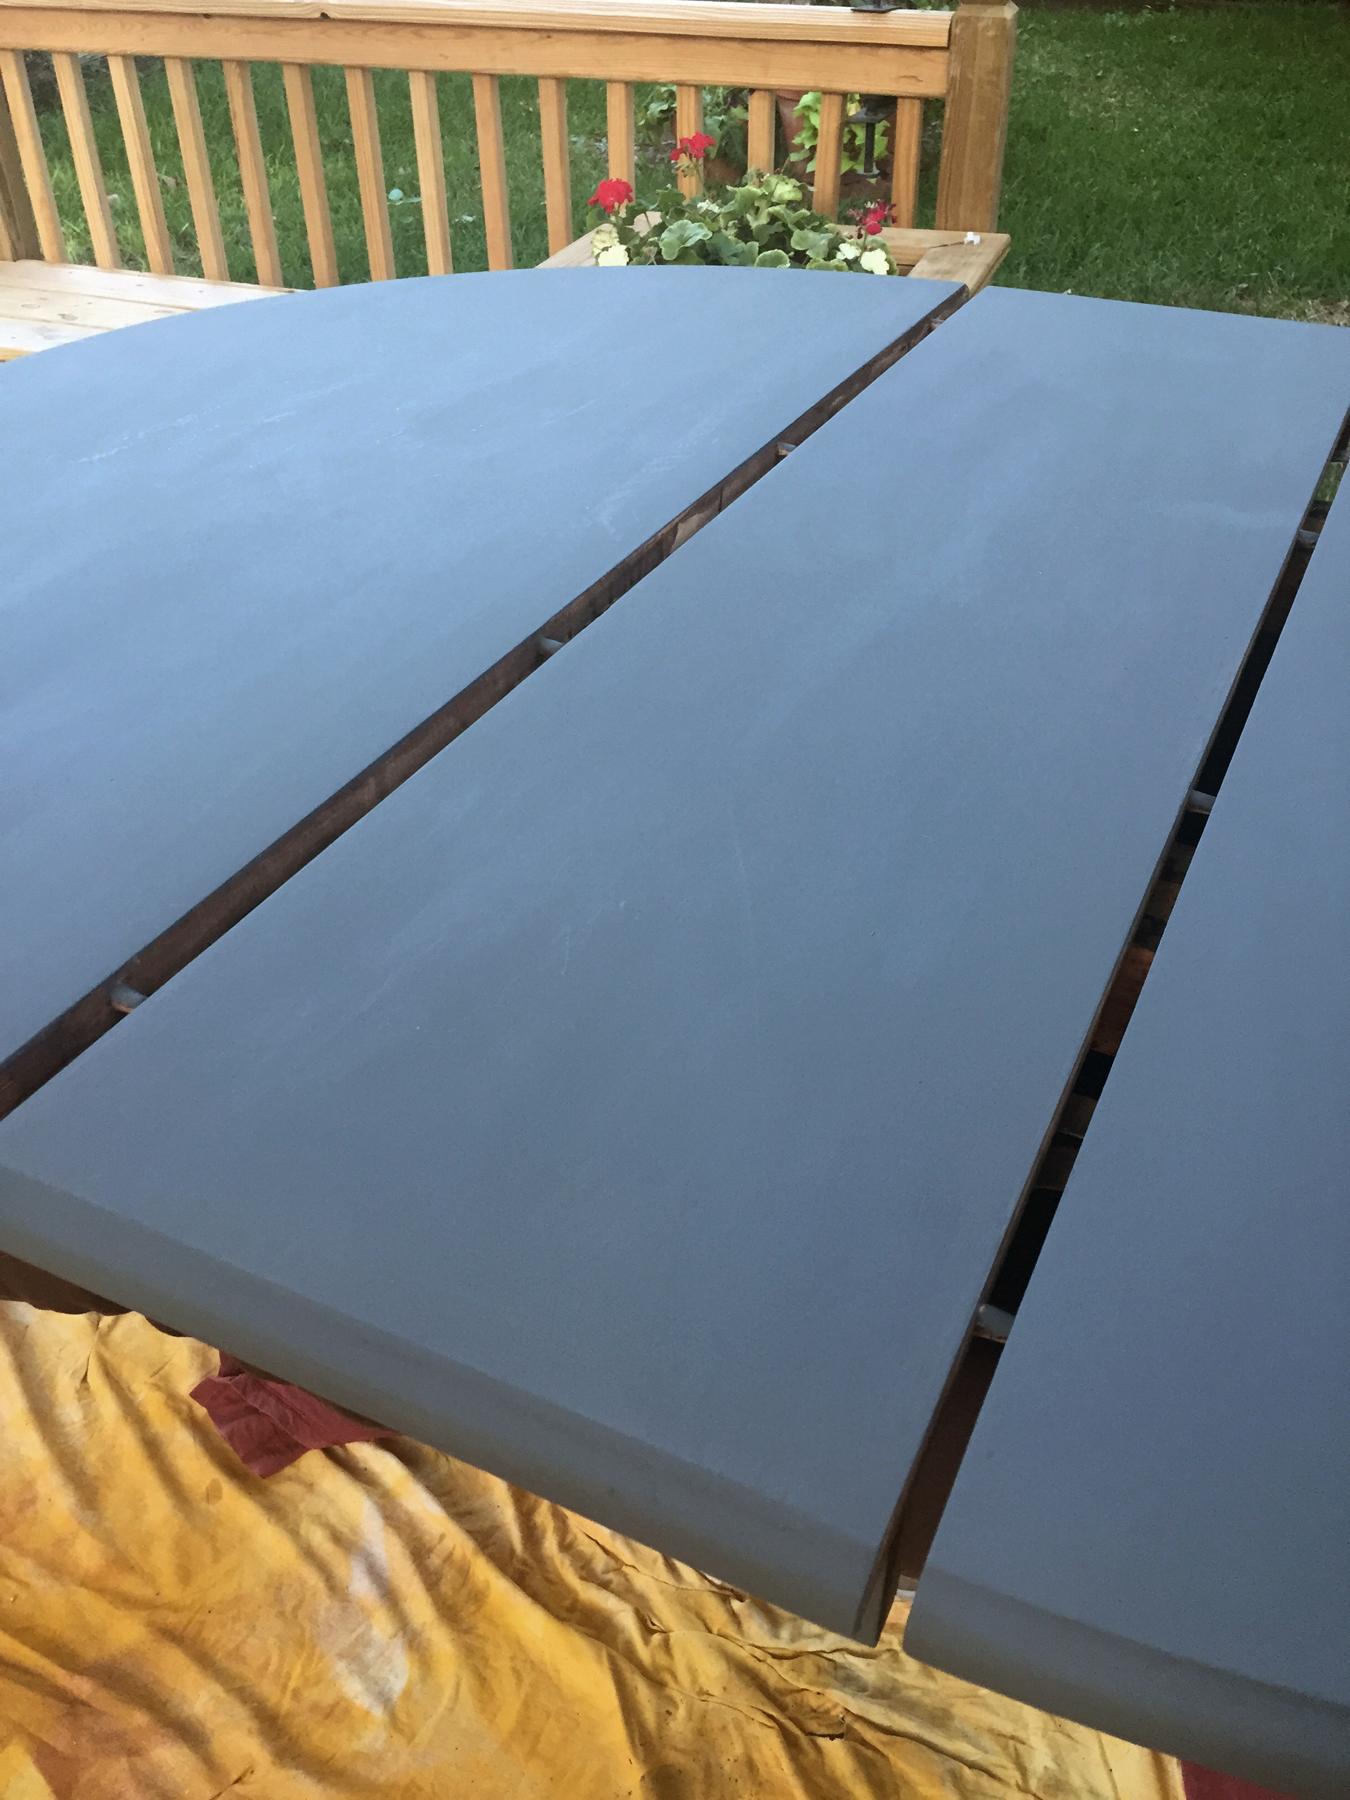 crimson + oak designs | graphite & metallic pedestal table tutorial STORY 010.JPG